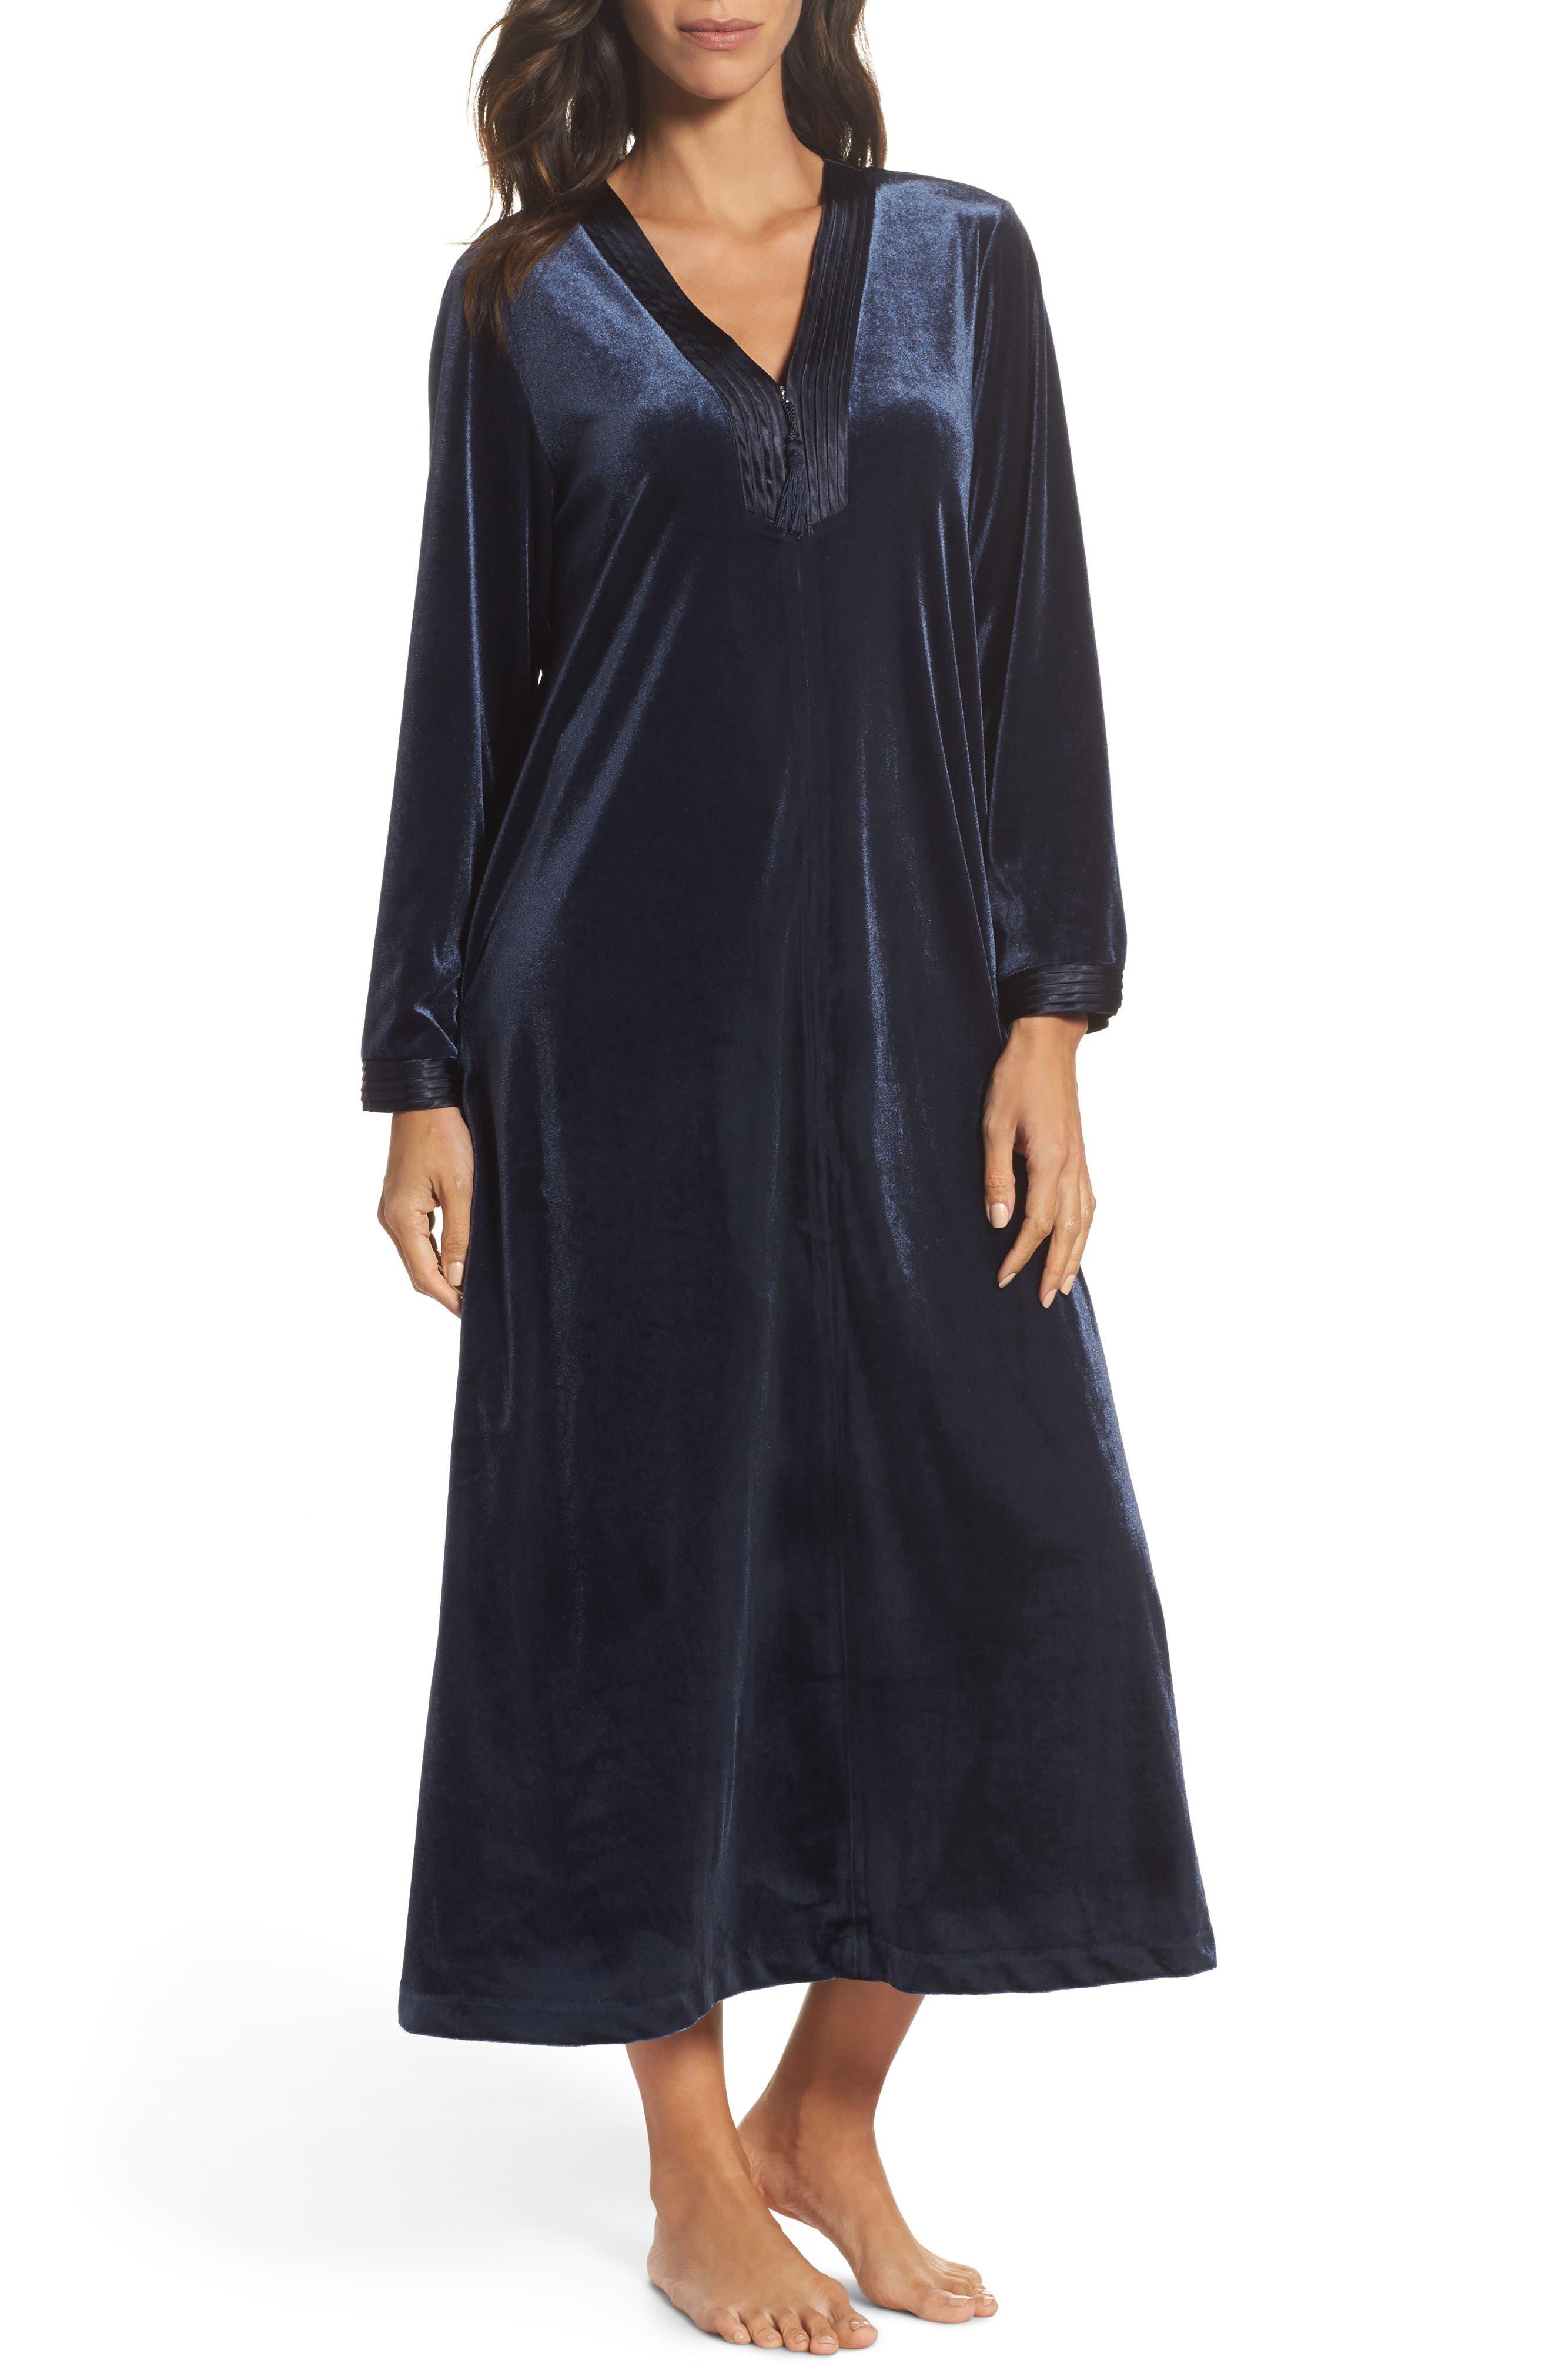 Main Image - Oscar de la Renta Sleepwear Velvet Caftan